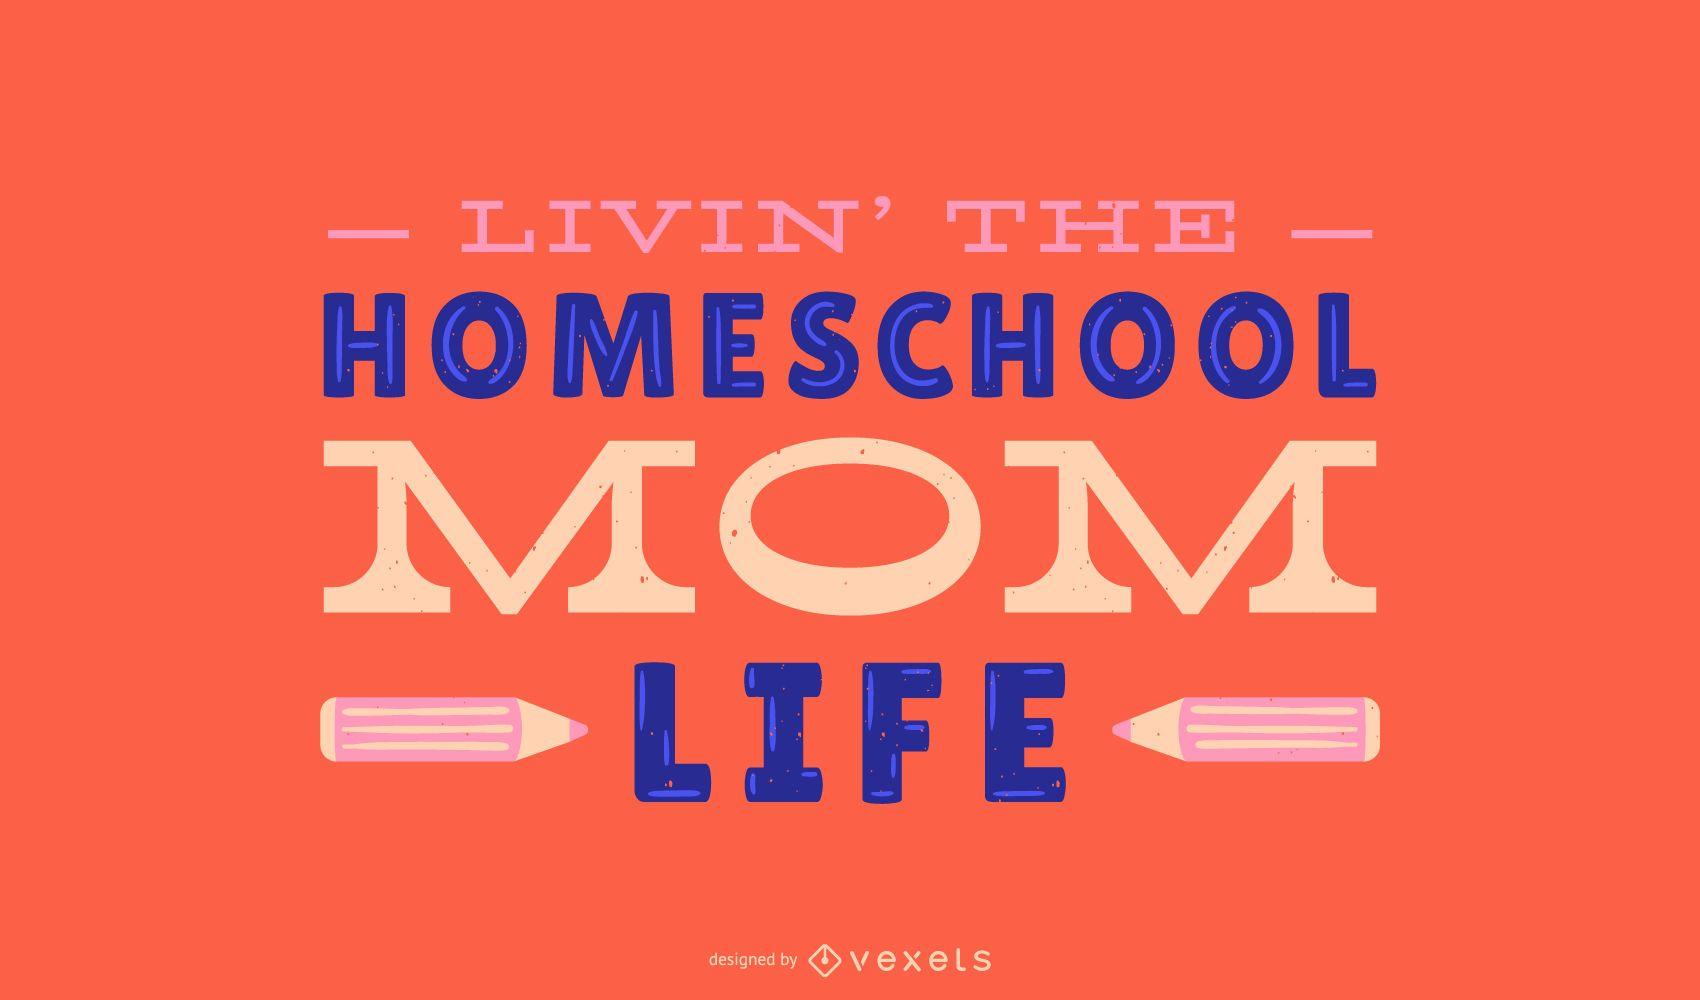 Homeschool mom life lettering design